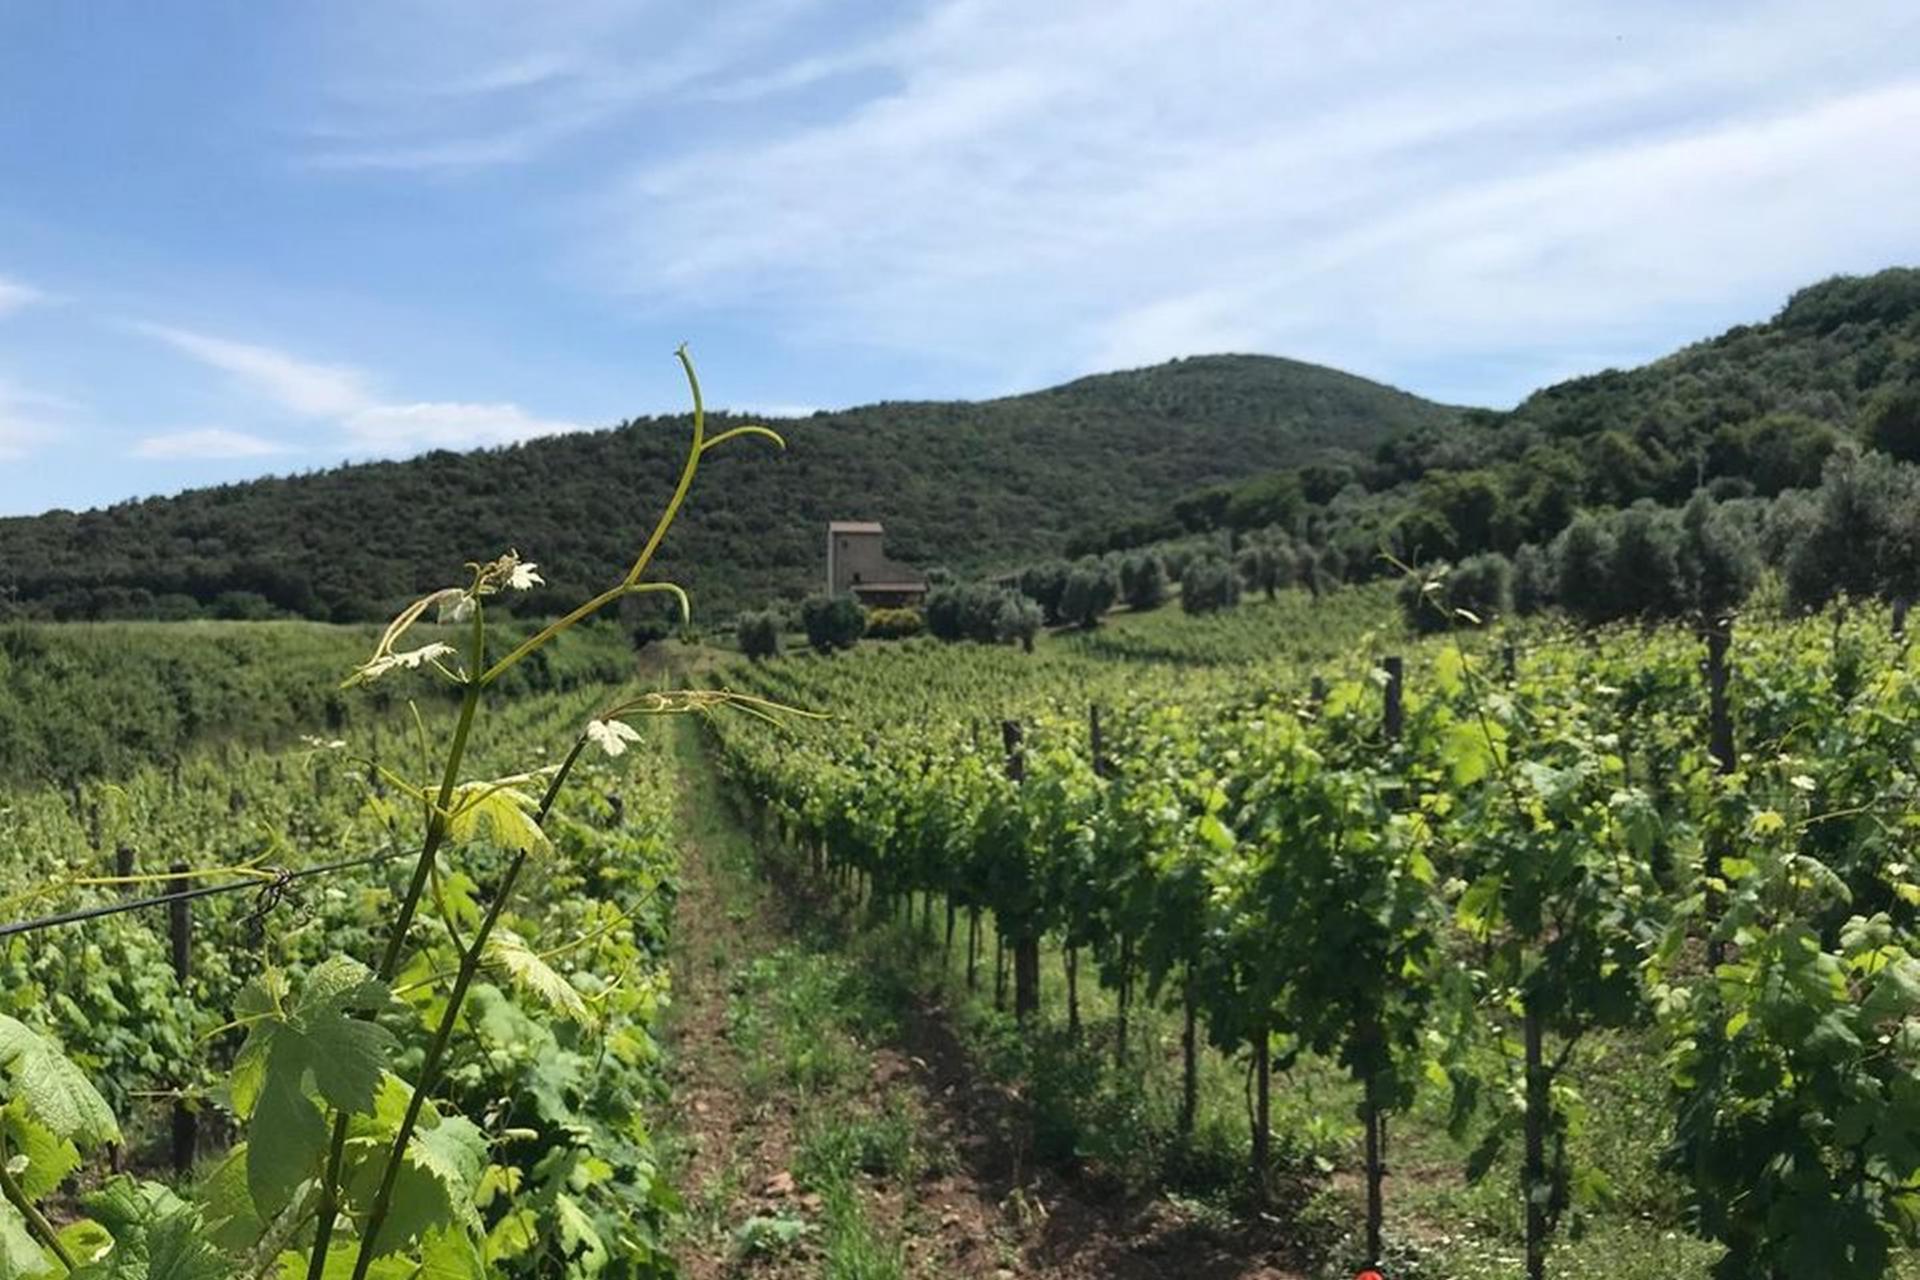 Agriturismo Toscane Agriturismo wijnboerderij Toscane - Chianti-streek   myitaly.nl